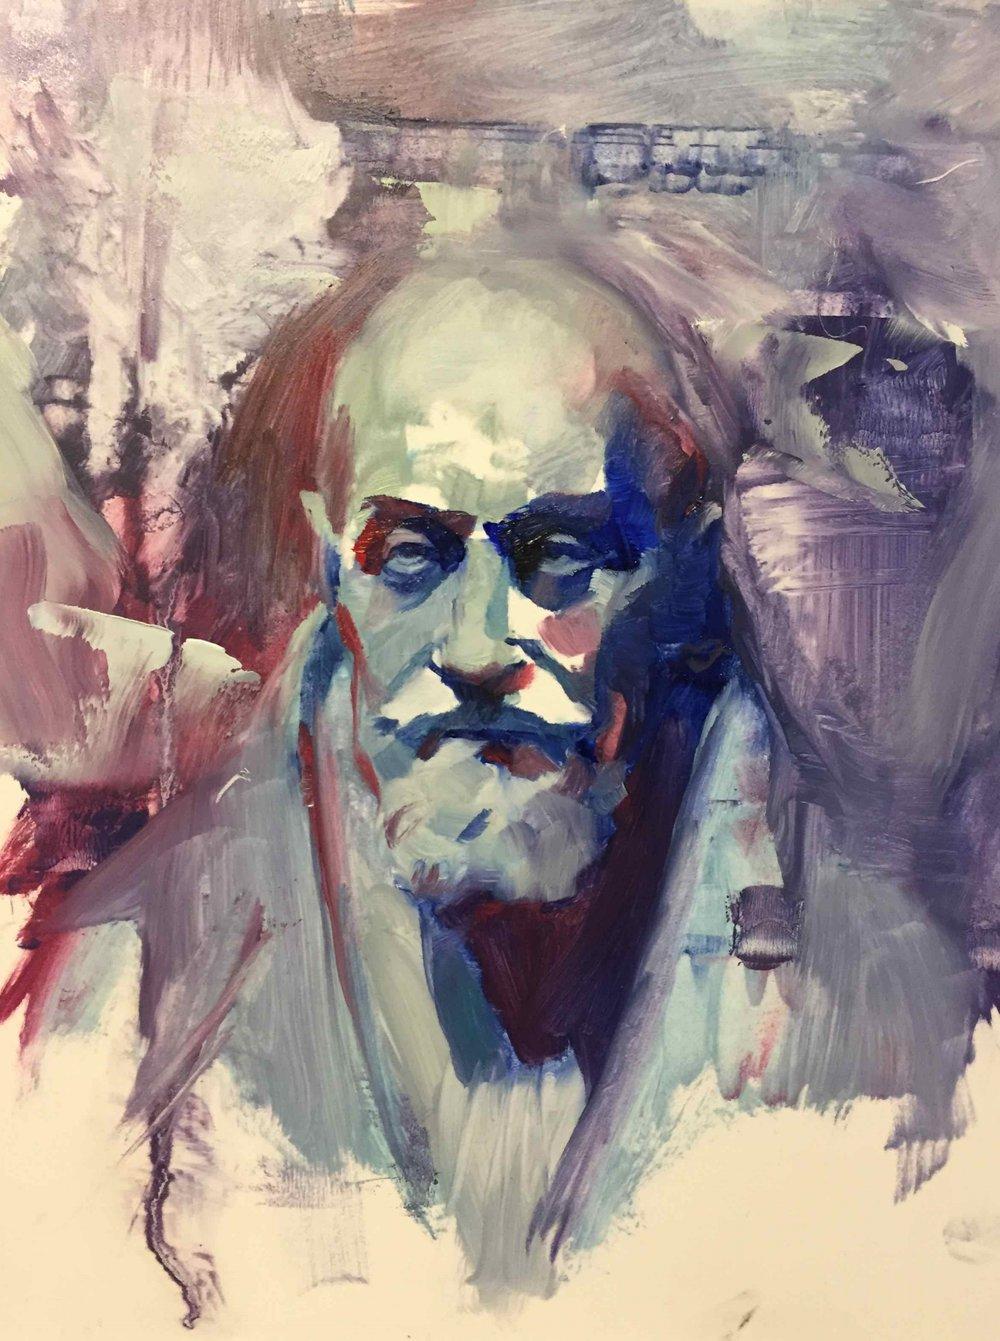 Chris Valentine  'Glitch III'  Oil on panel  25 x 20 cm